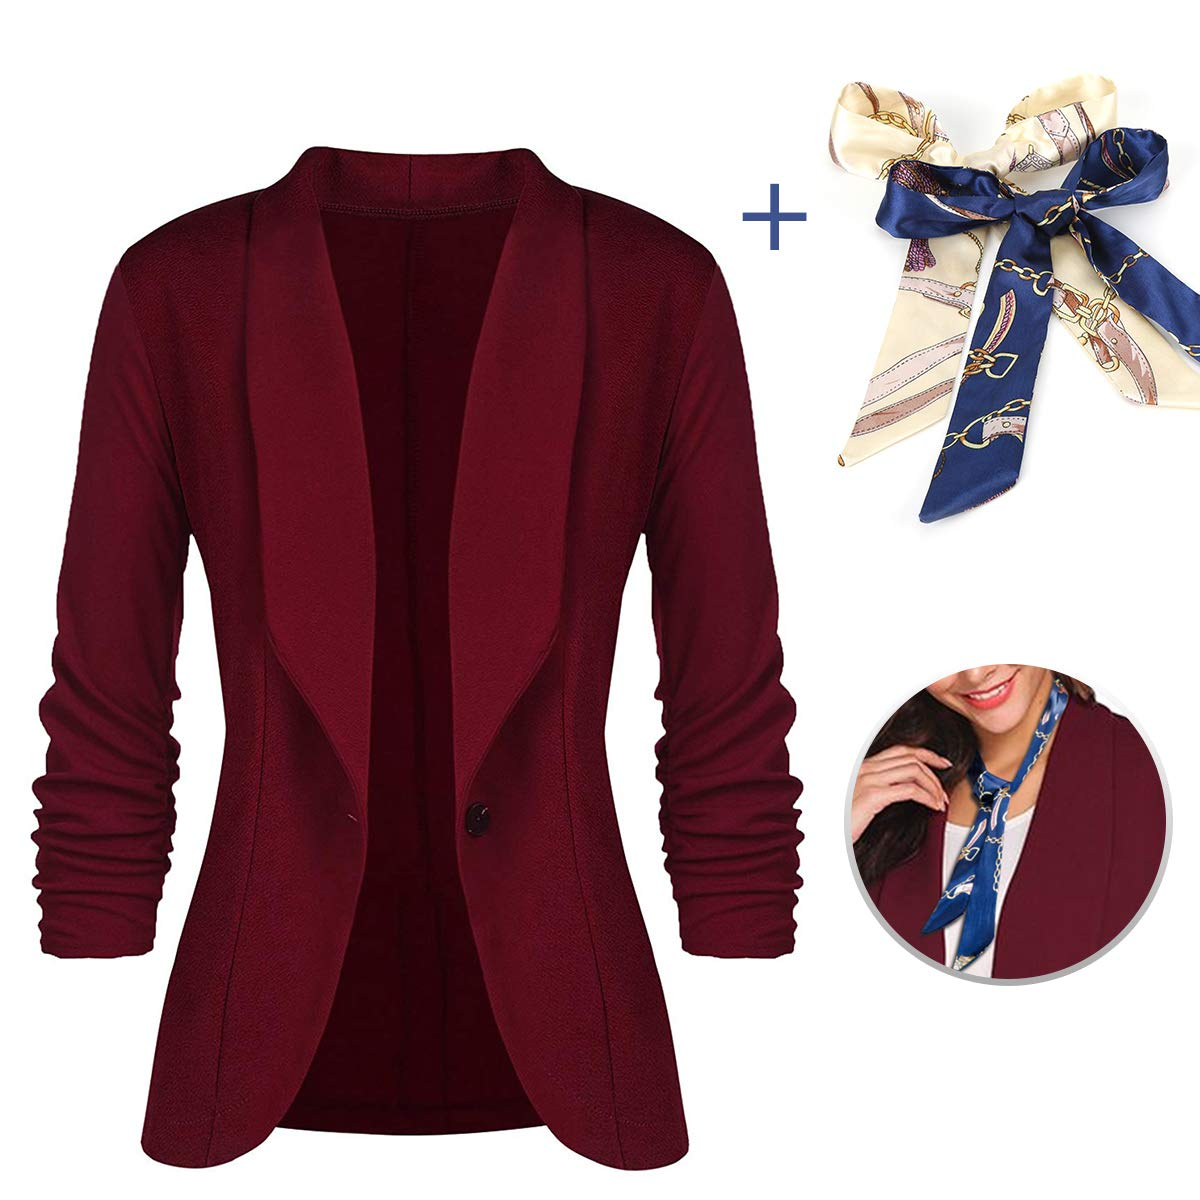 LATH.PIN Women Blazer 3/4 Sleeve-Stretch Open-Front Casual Cardigan Jacket Lightweight Work Office Blazers (Wine Red, S)